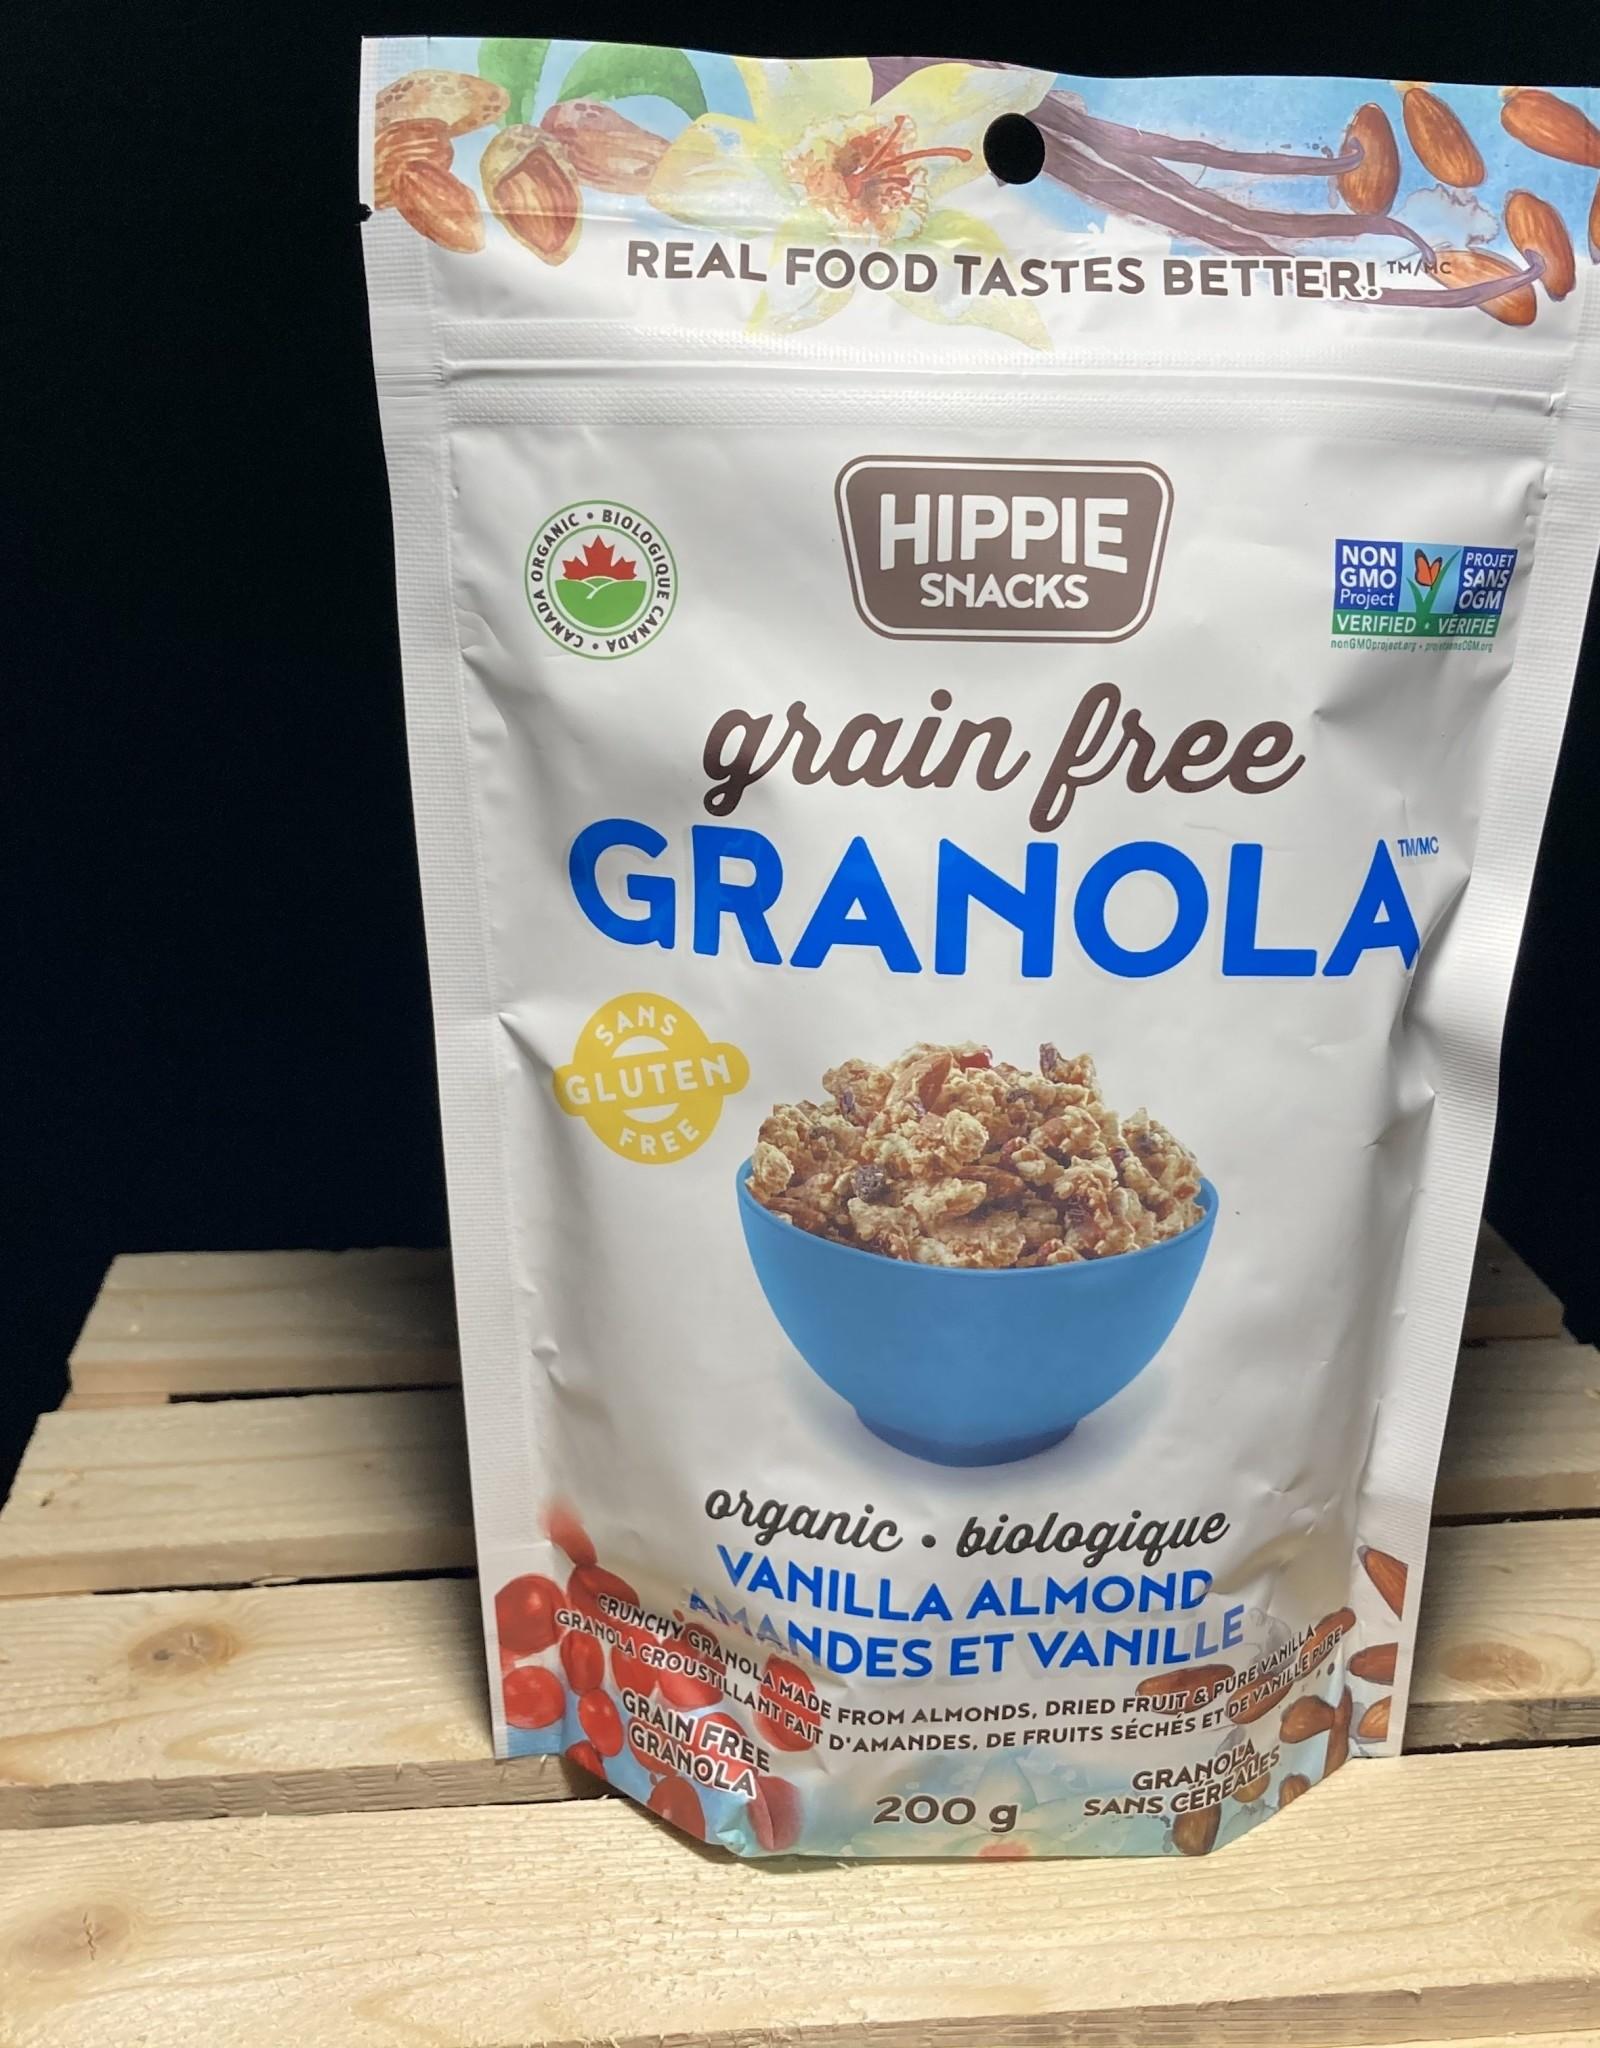 Hippie Snacks Hippie Snacks - Granola, Vanilla Almond